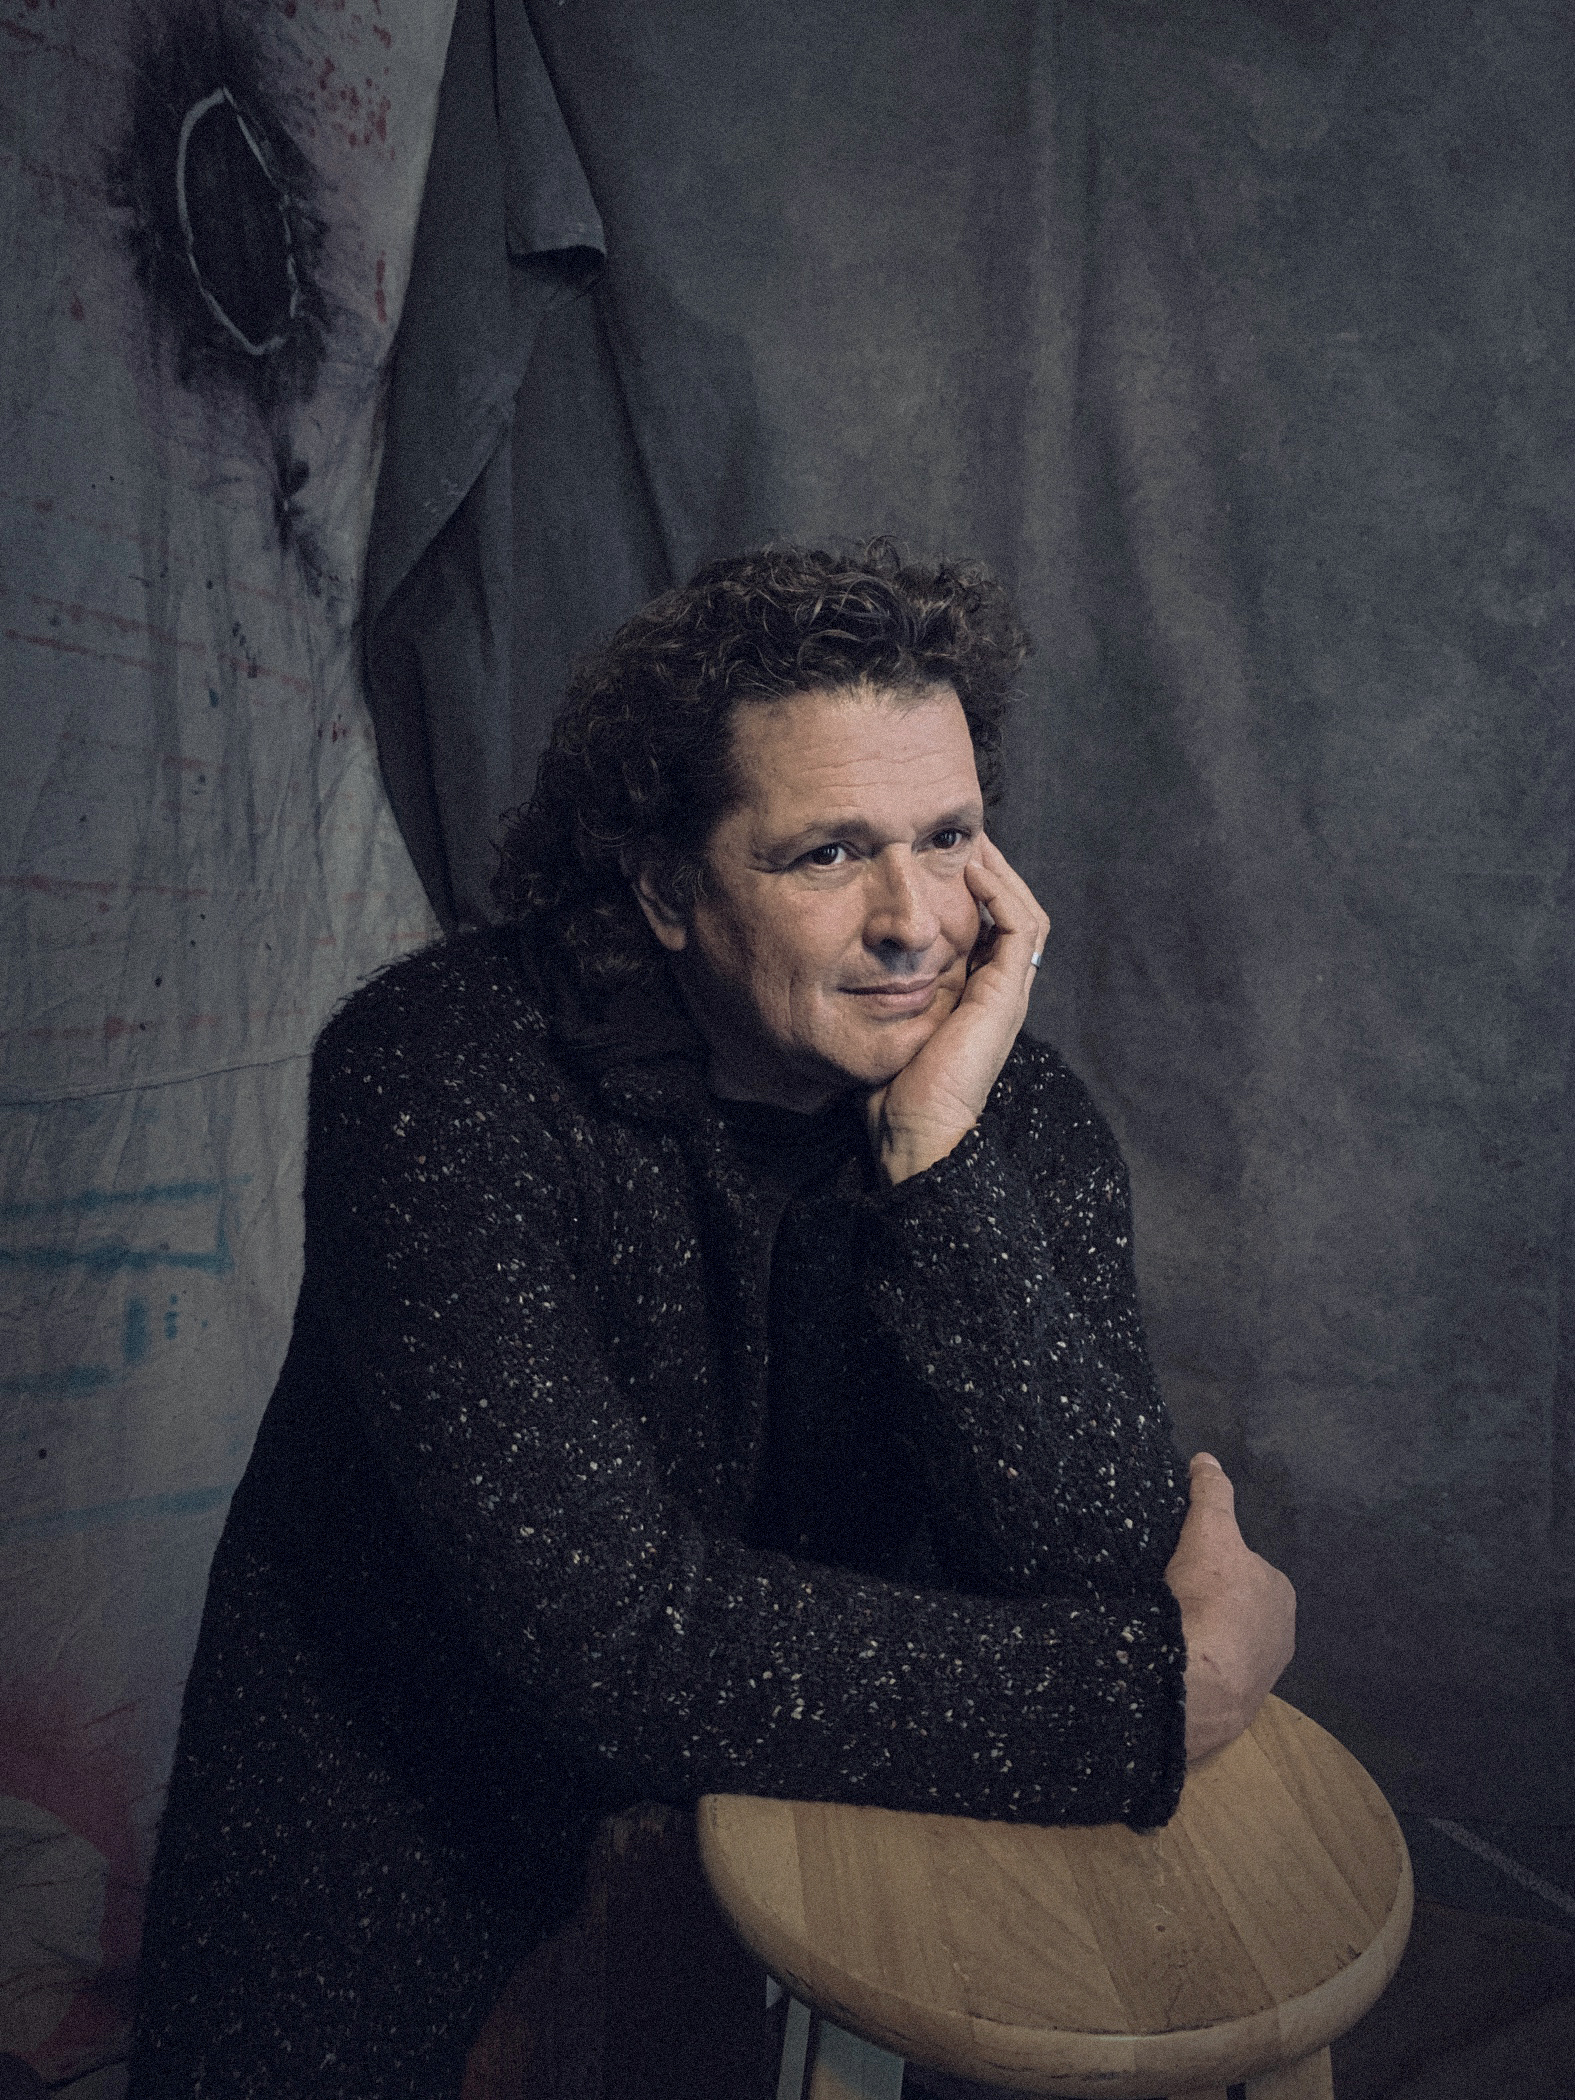 Carlos Vives Apple Suite at Latin Grammys 181113-2066 LOW RES by Omar Cruz